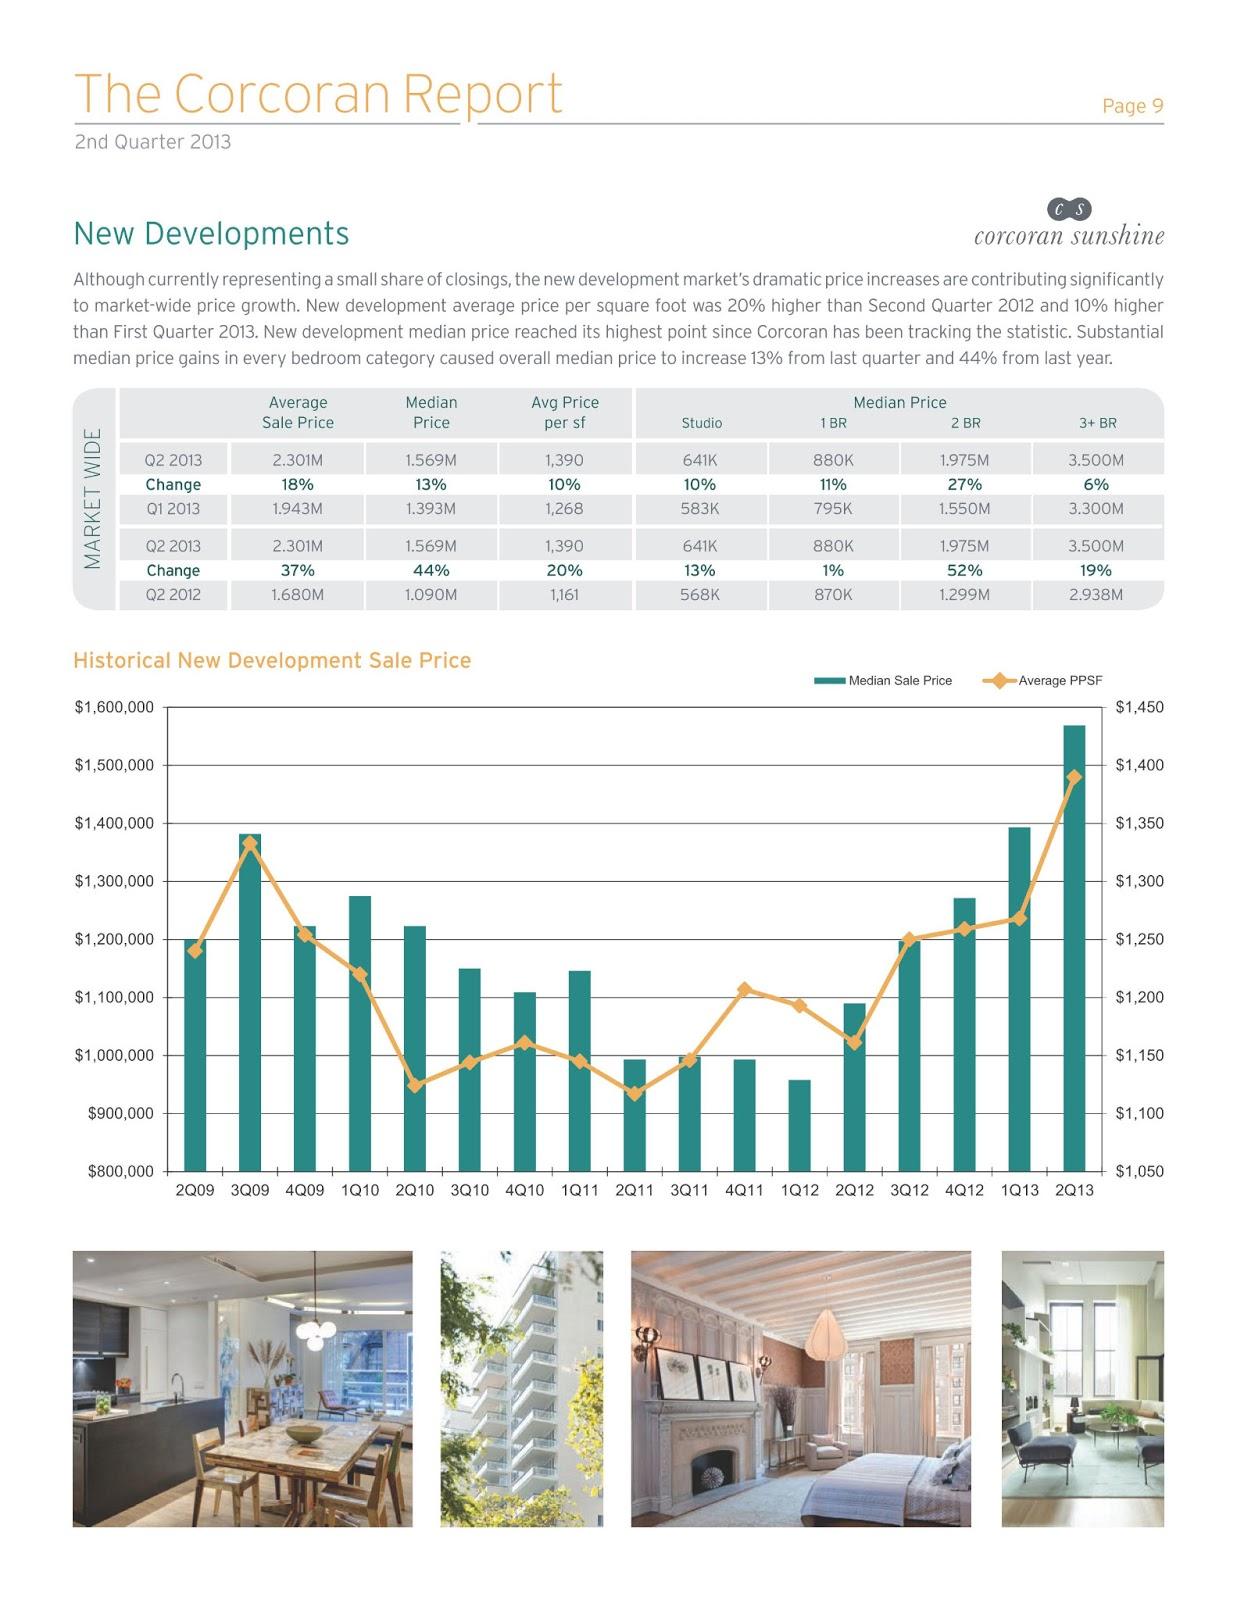 Program of nyc finance property tax nyc finance property tax increase